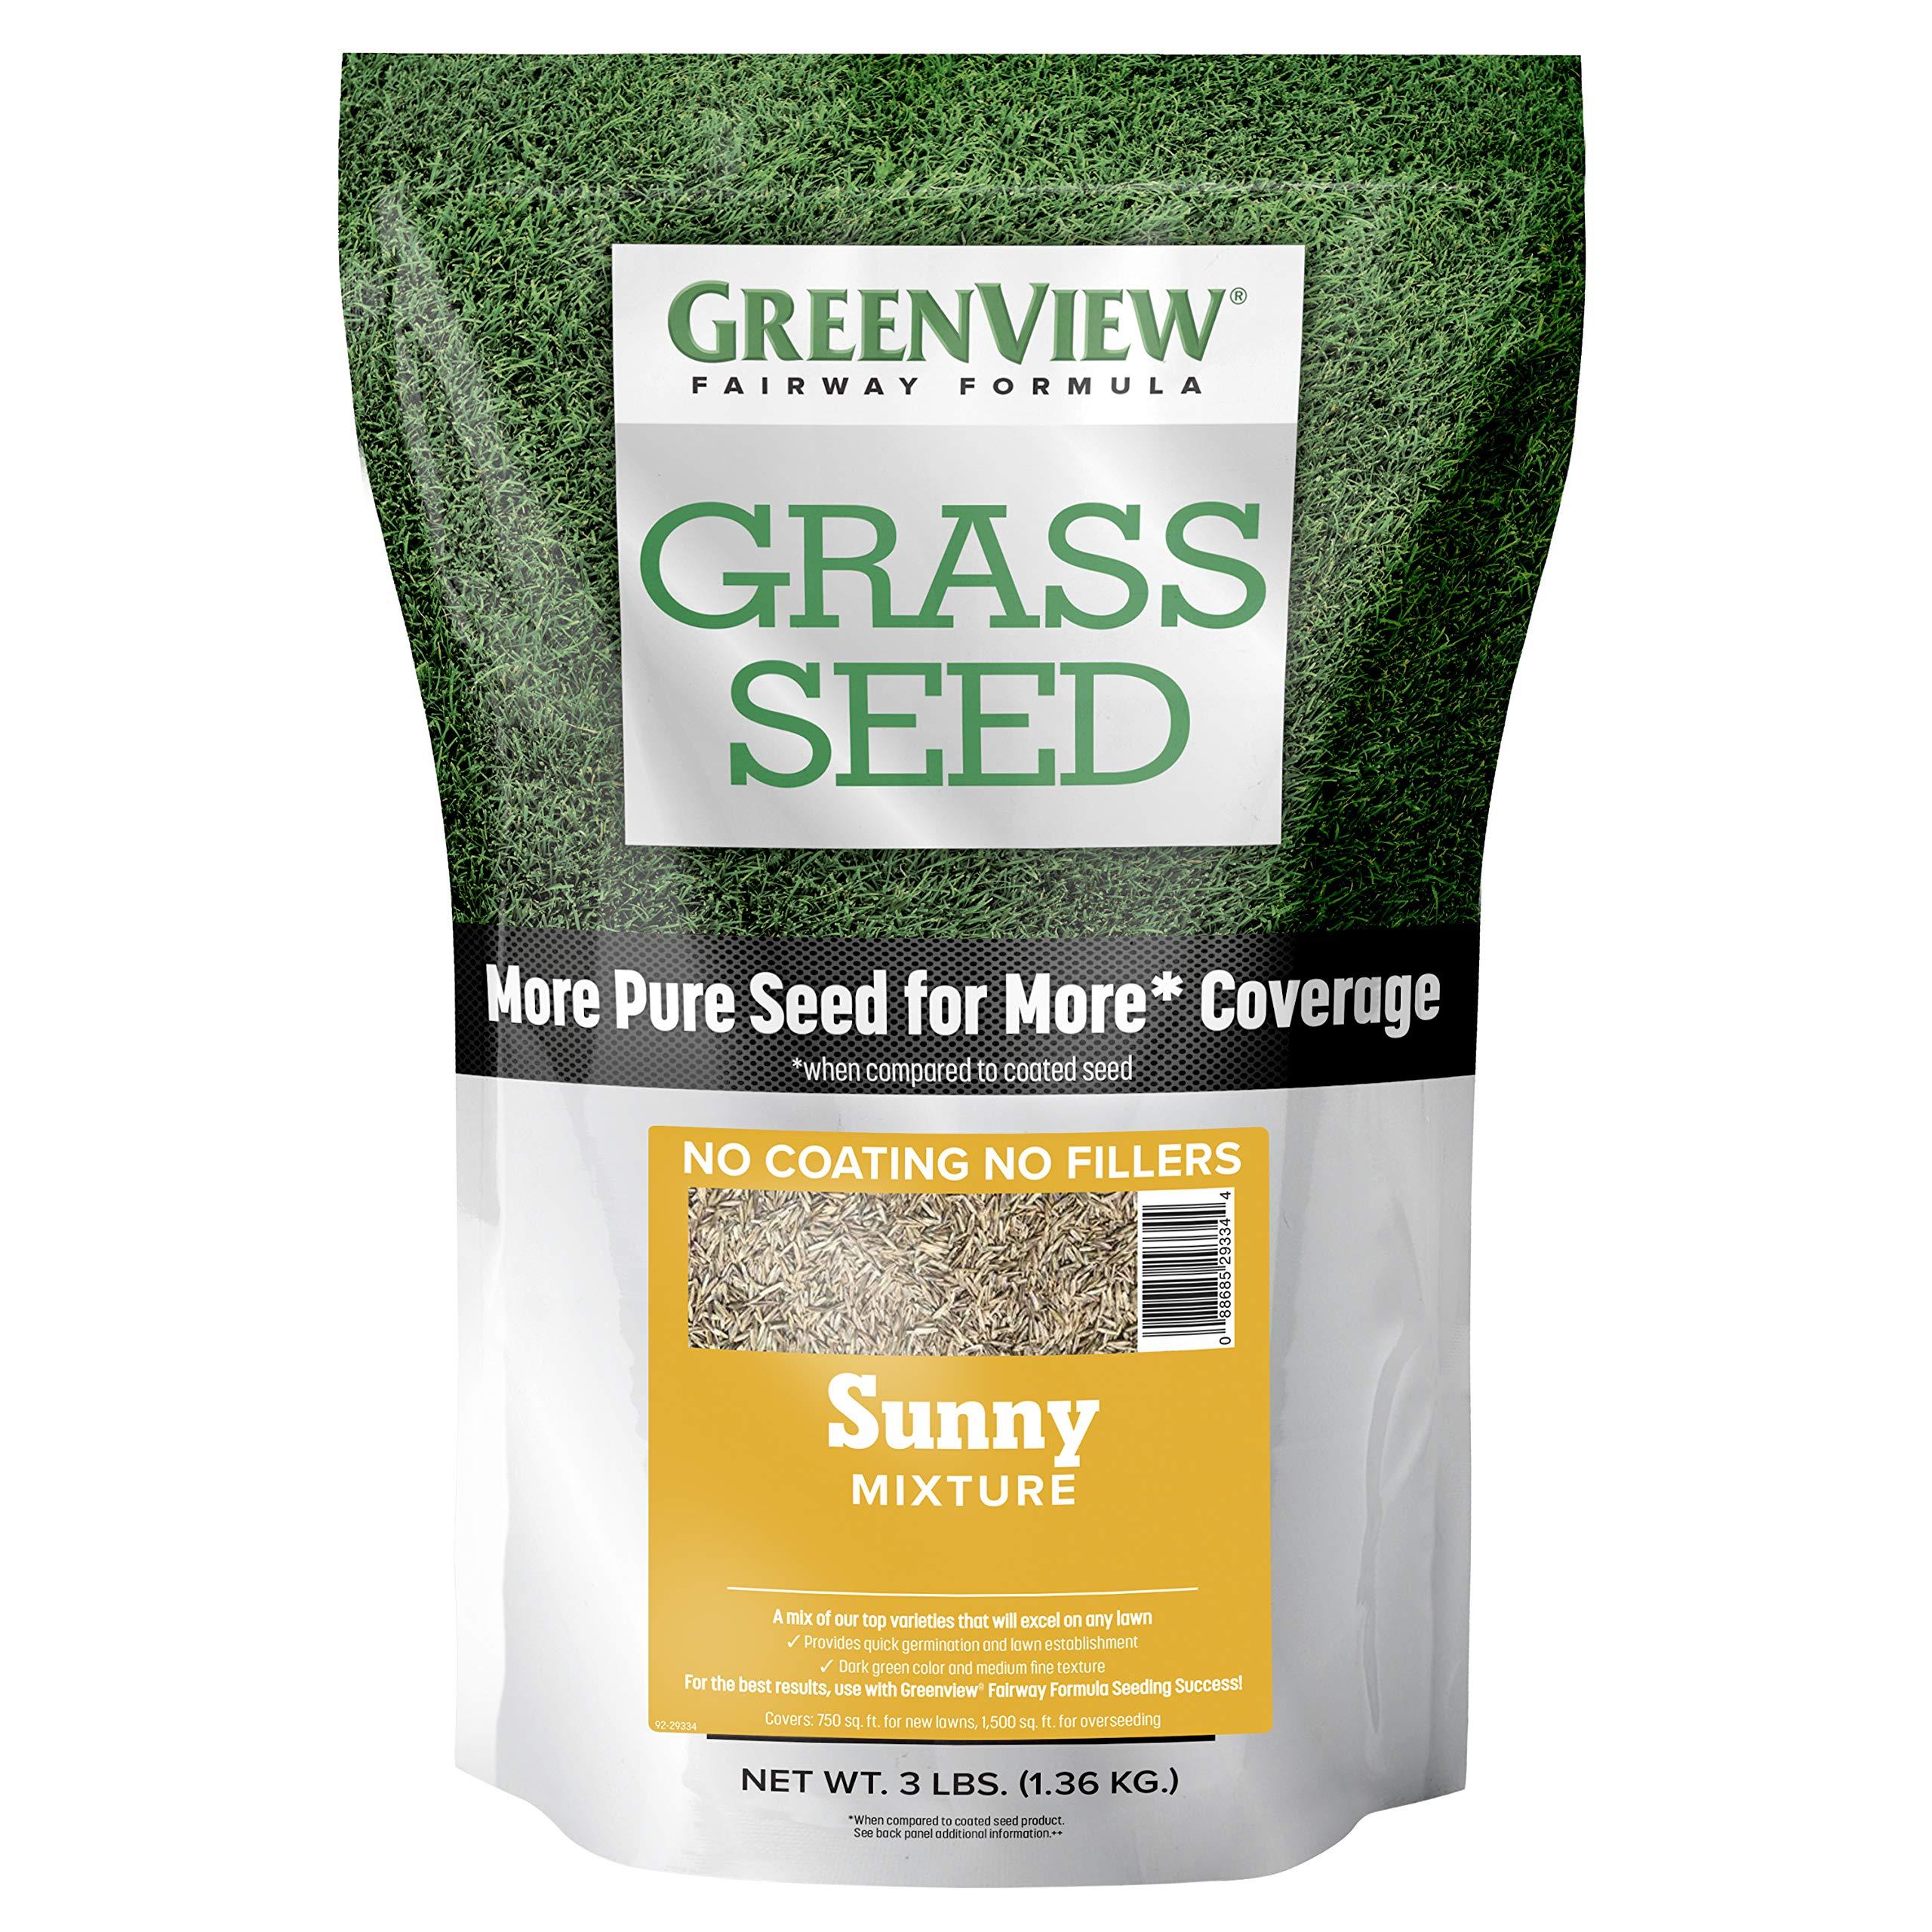 GreenView 2829339 Fairway Formula Grass Seed Sunny Mixture - 3 lb.